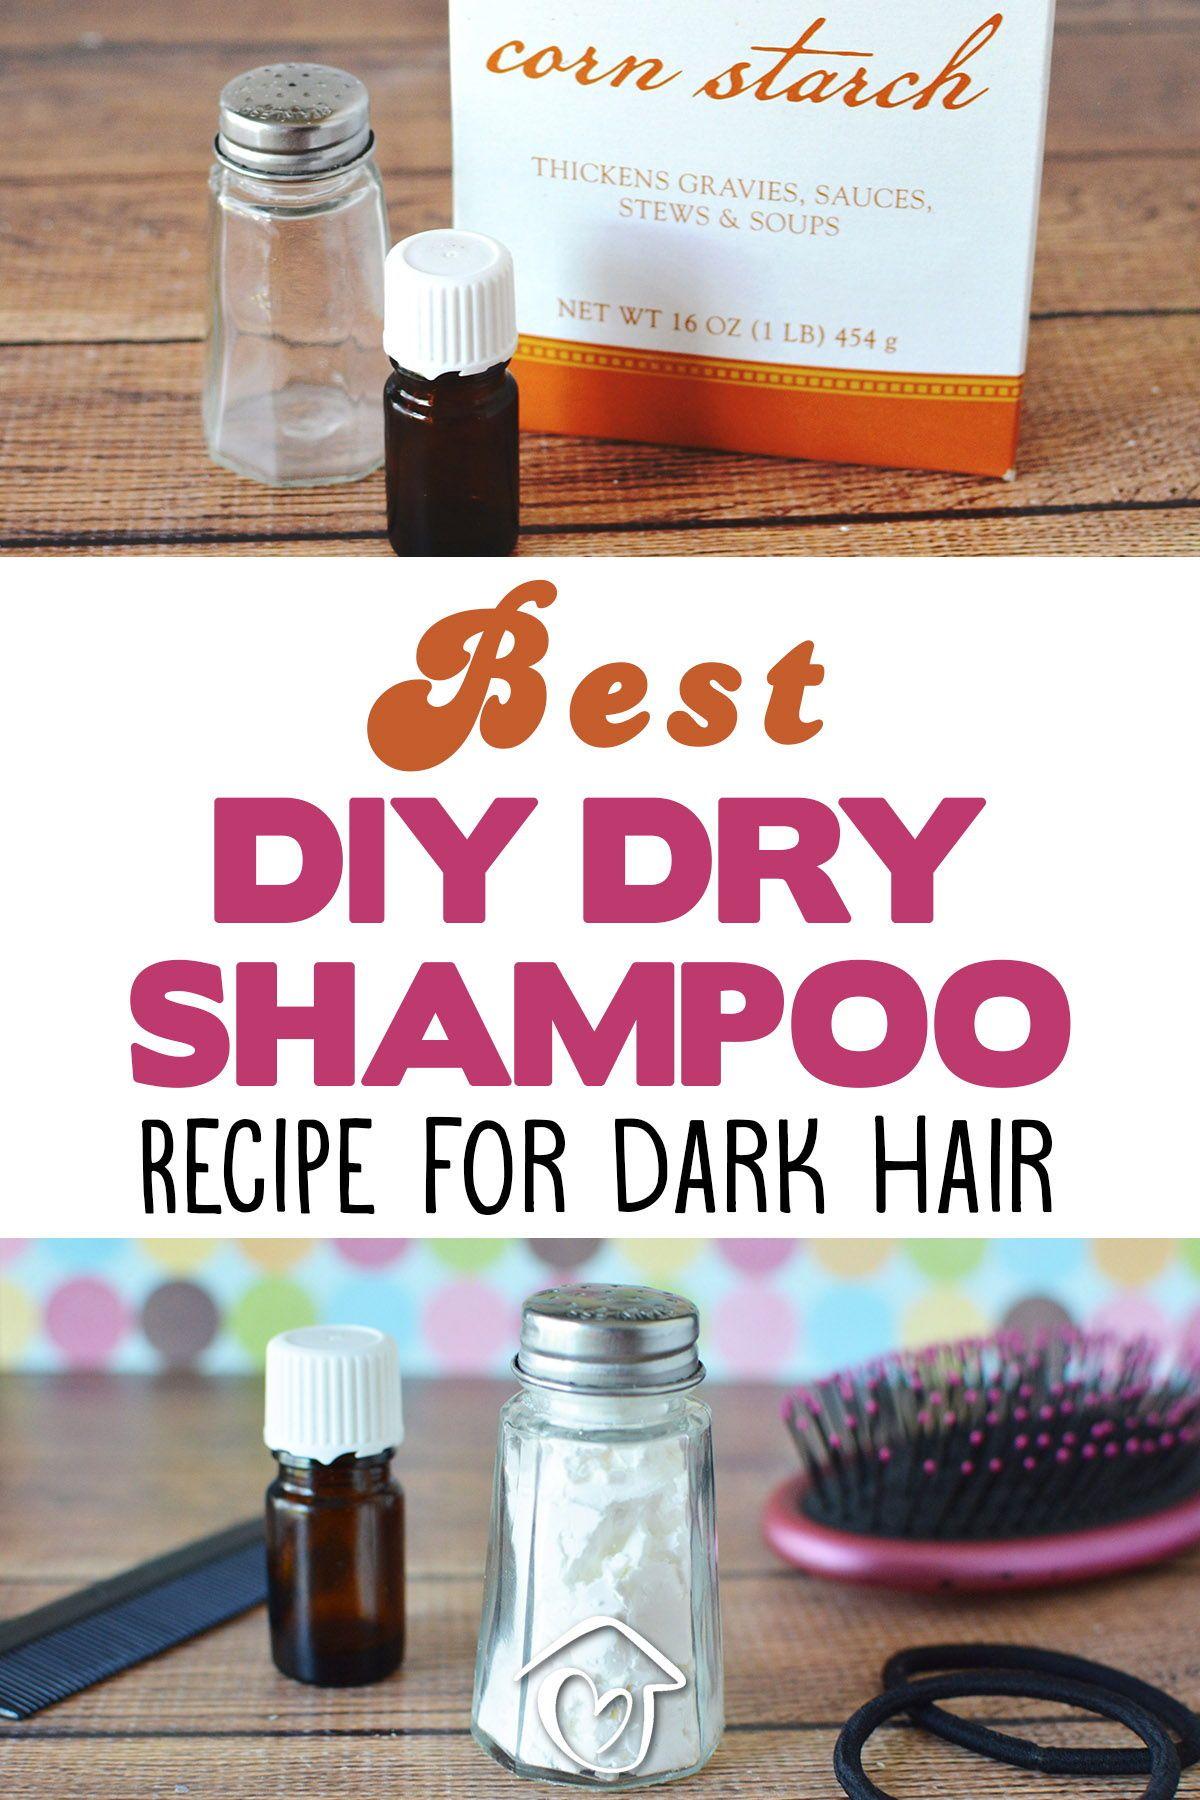 Cinnamon Cookie Scented Dry Shampoo Recipe For Heavenly Hair Diy Dry Shampoo Shampoo Recipe Dry Shampoo